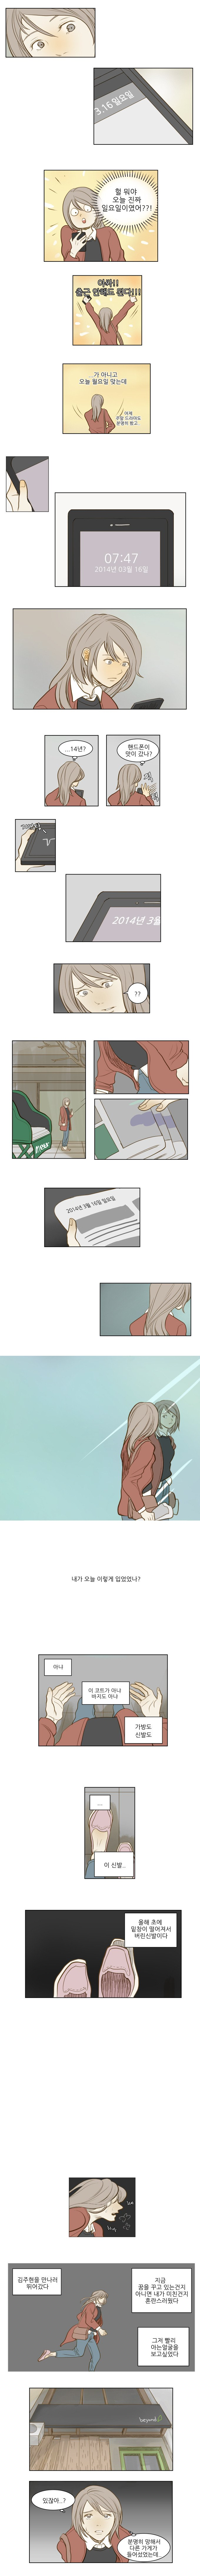 2.jpg 시간은 거꾸로 흐른다.manga [BGM] 시간은 거꾸로 간다.manhwa